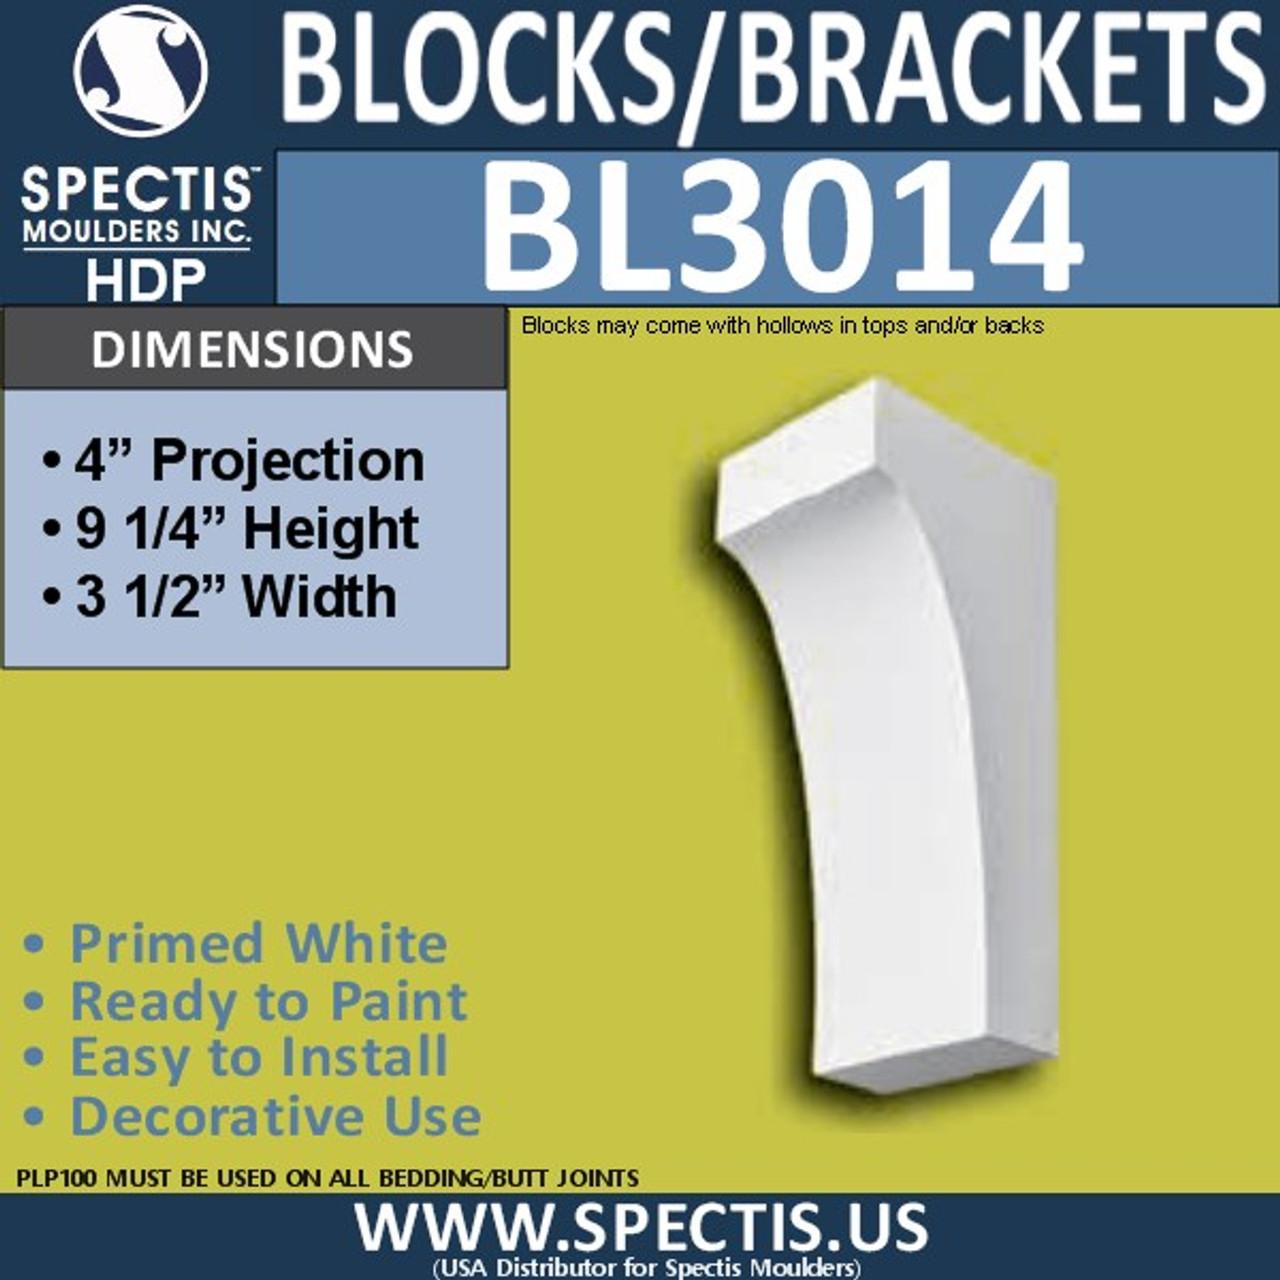 "BL3014 Eave Block or Bracket 3.5""W x 4""H x 9.25"" P"